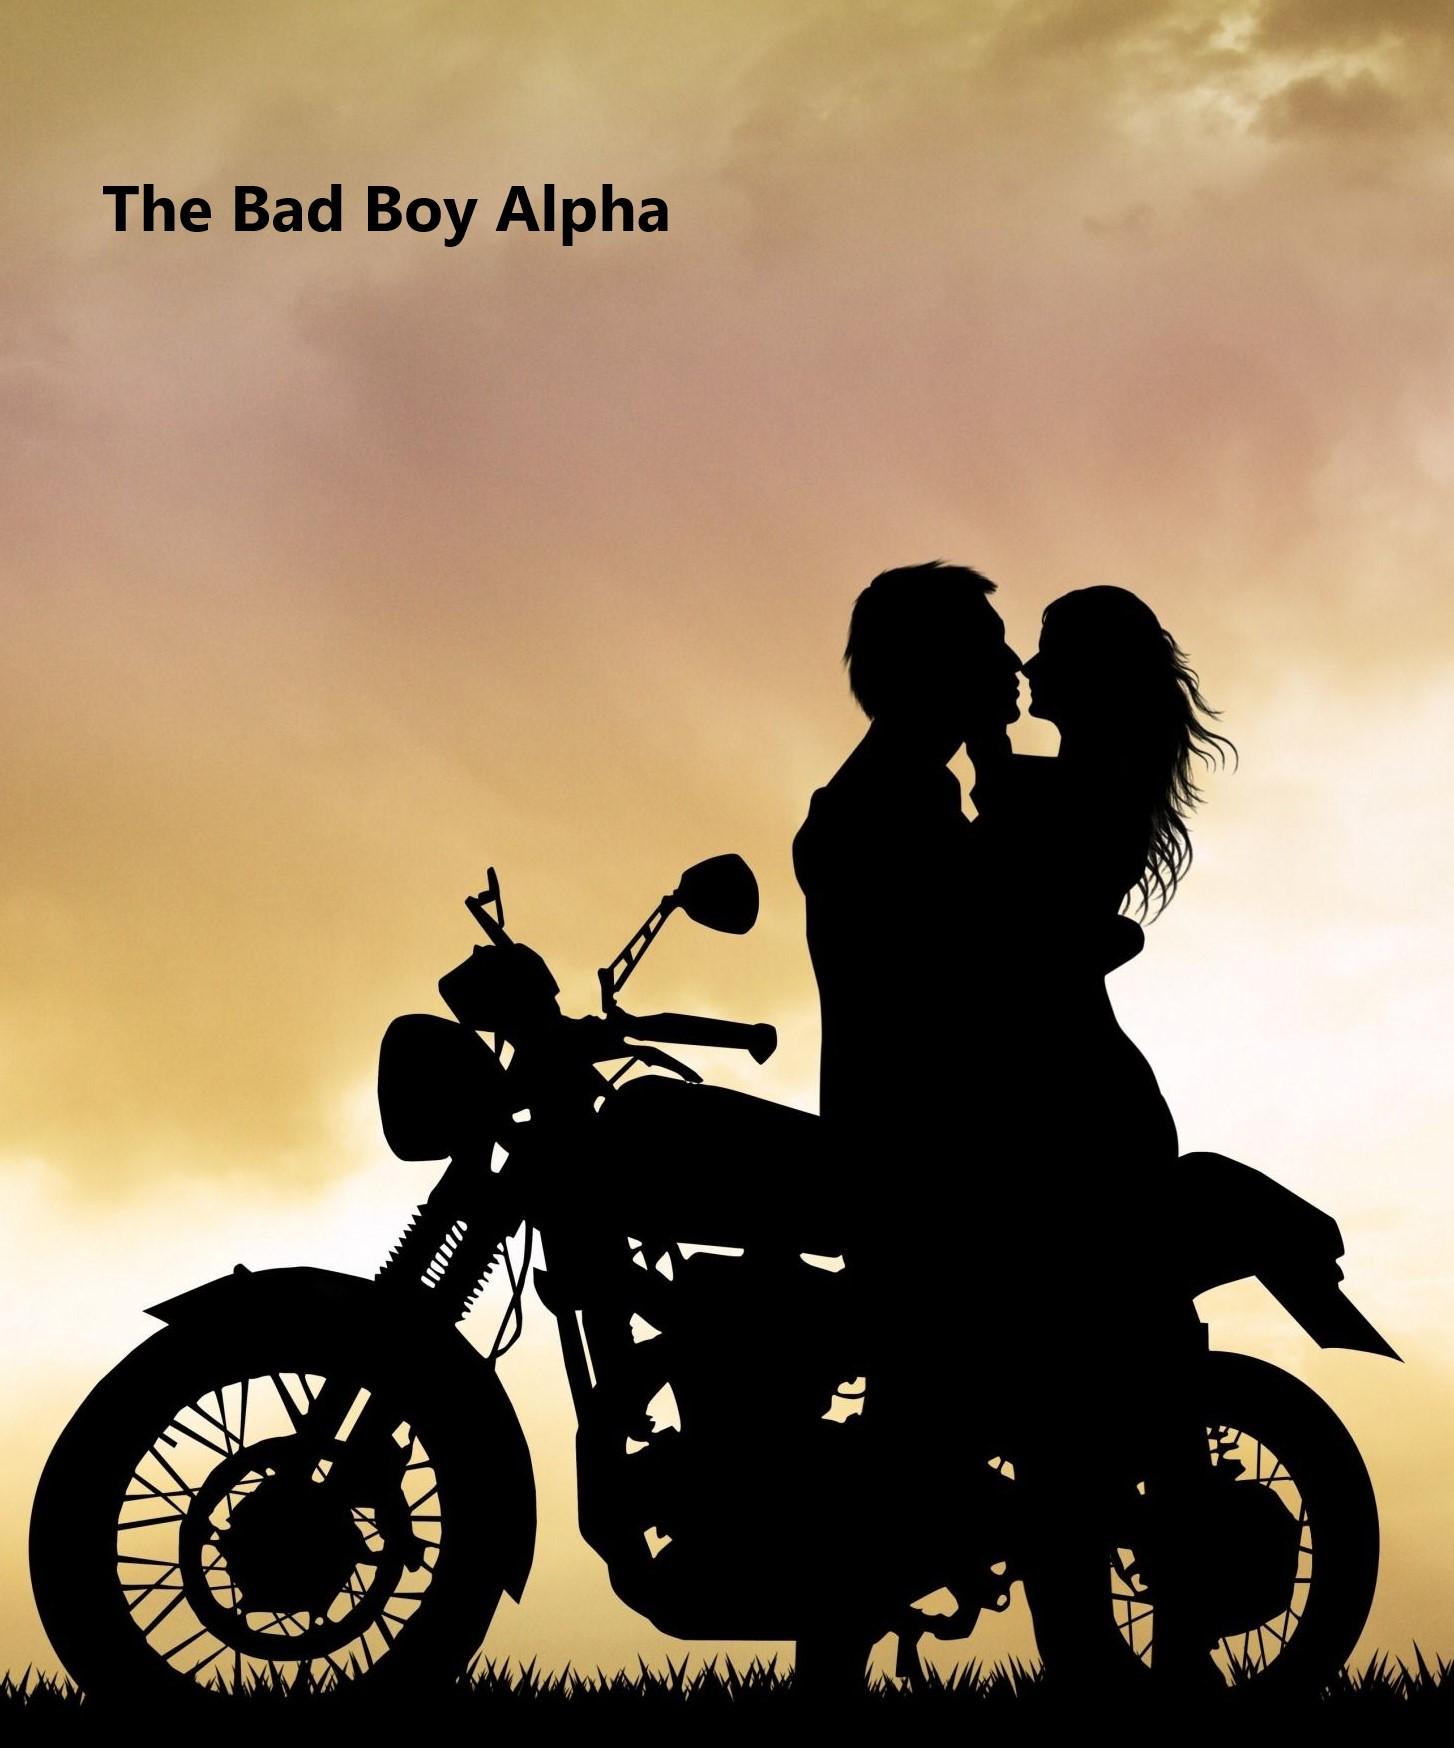 The Bad Boy Alpha